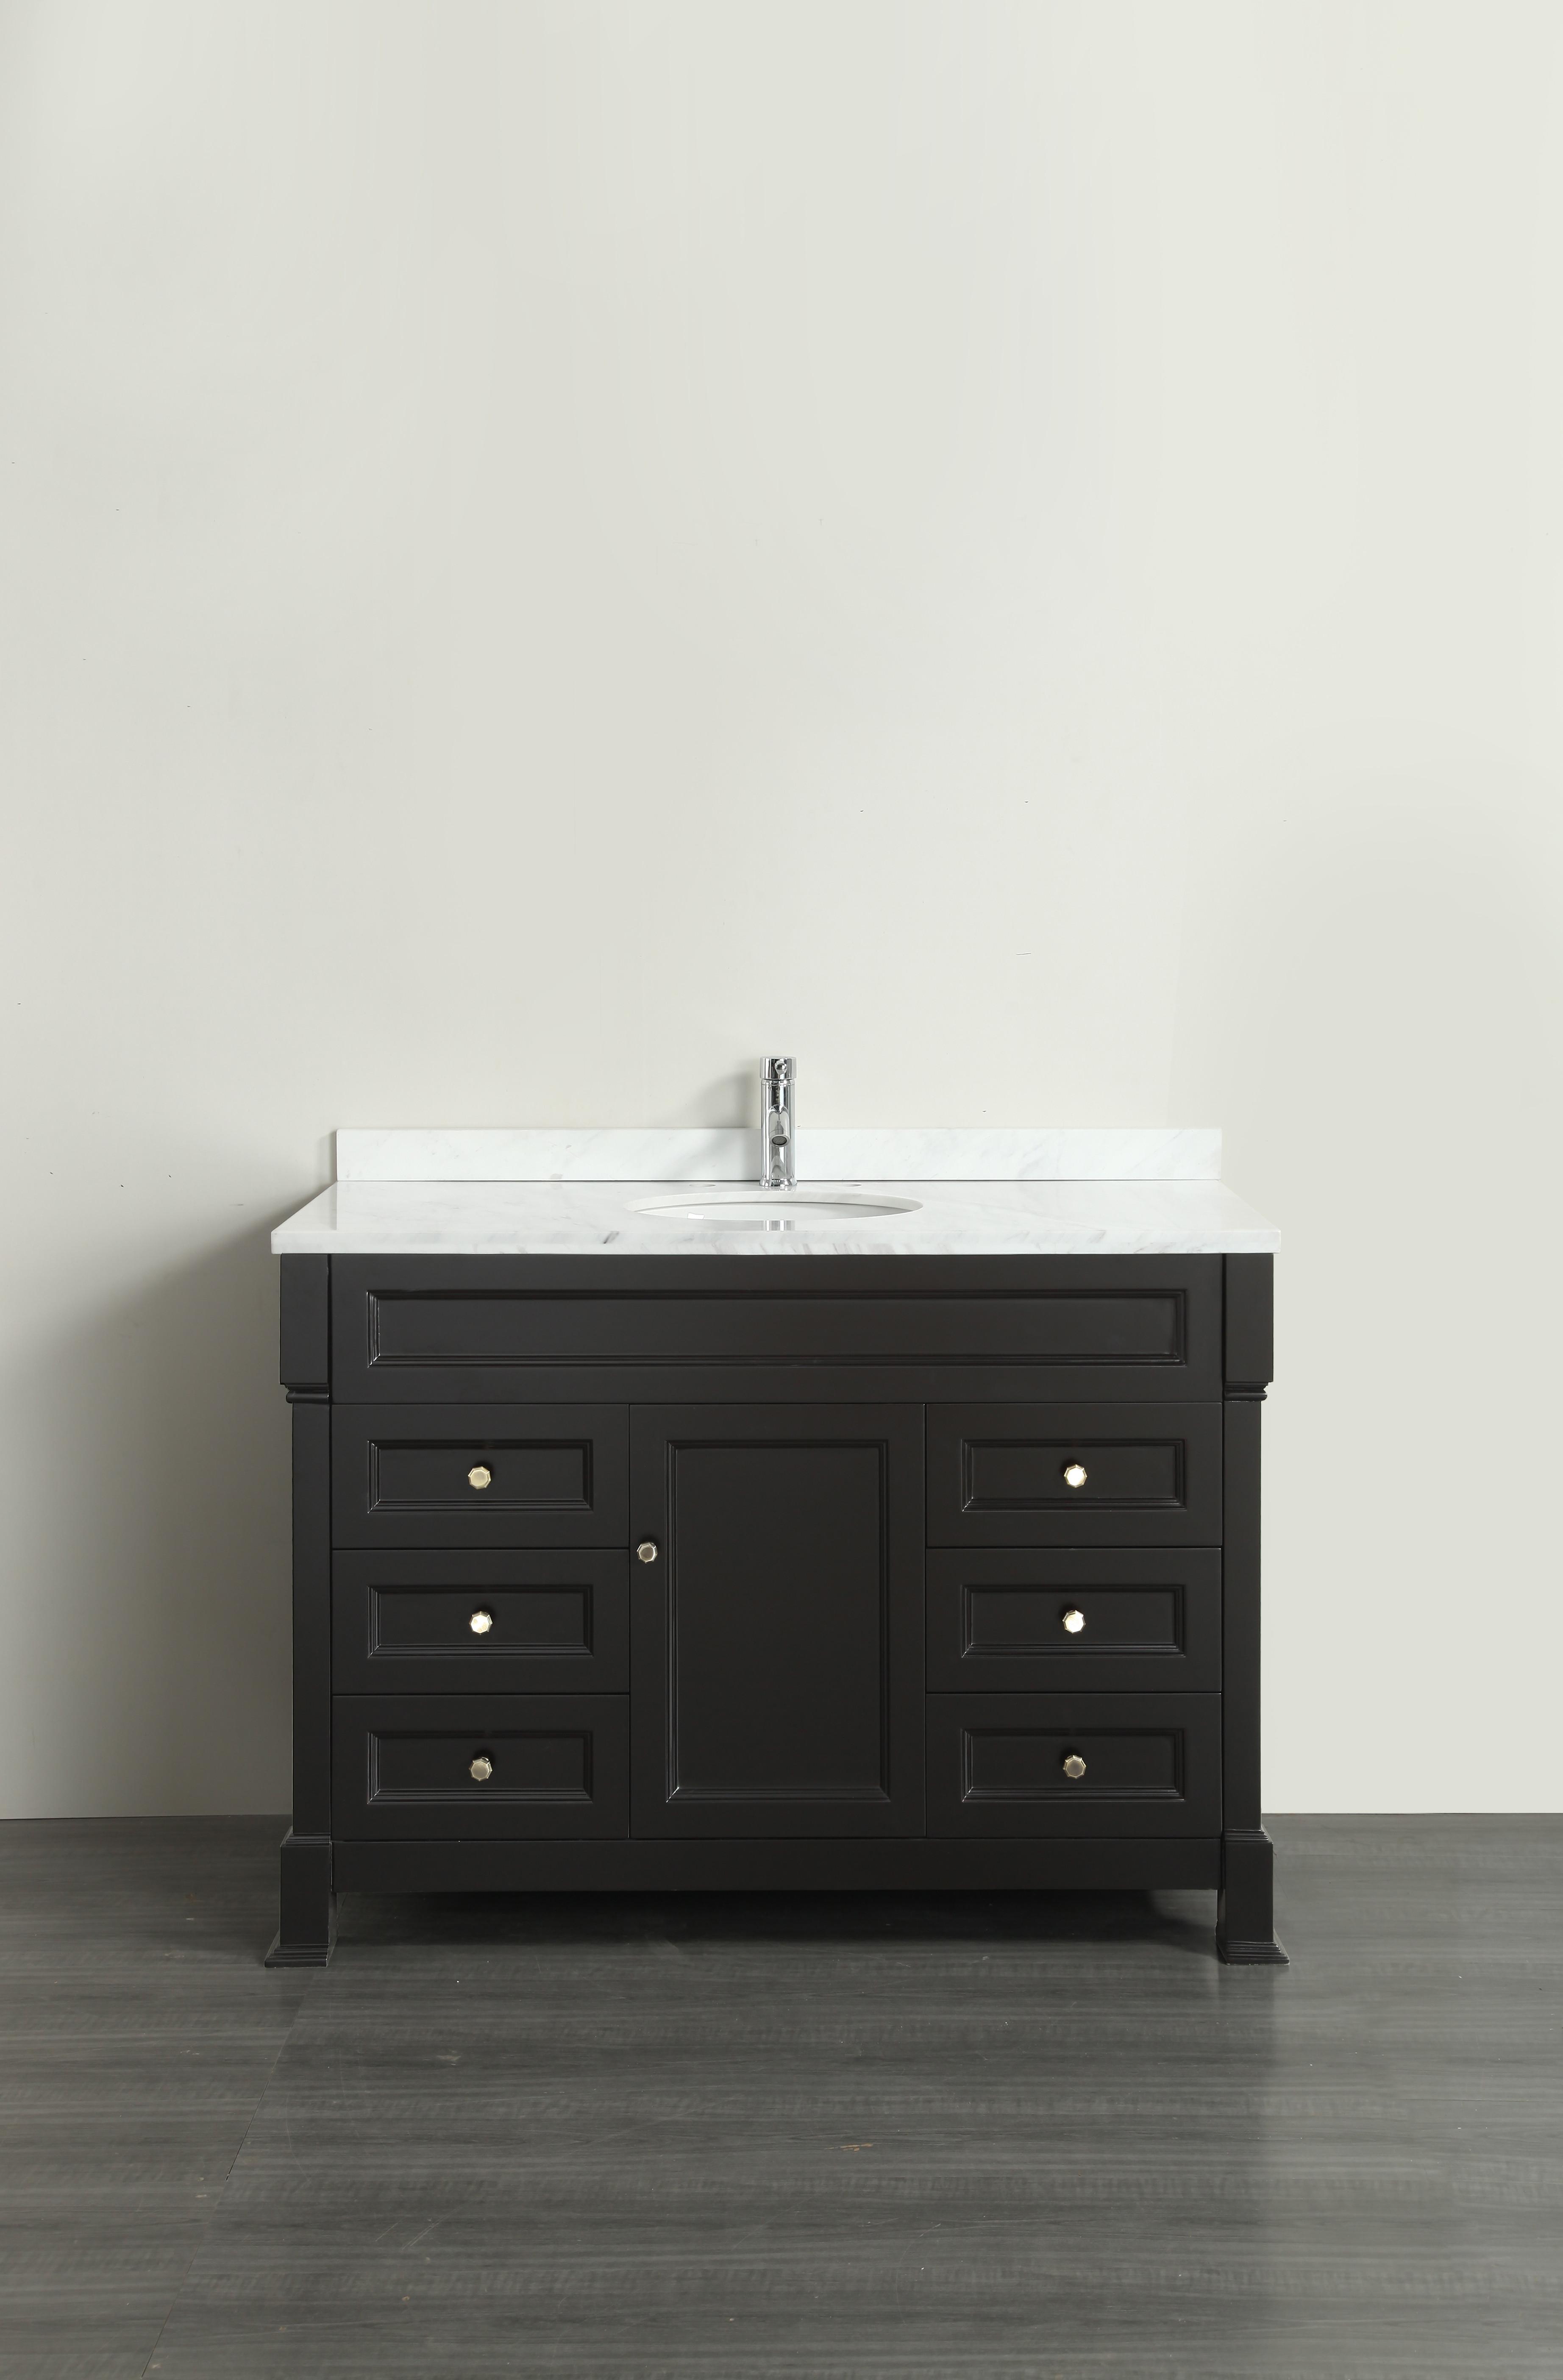 Eviva EVVN78-48ES Tim Espresso Bathroom Vanity with White Carrera Counter-top & Porcelain Sink